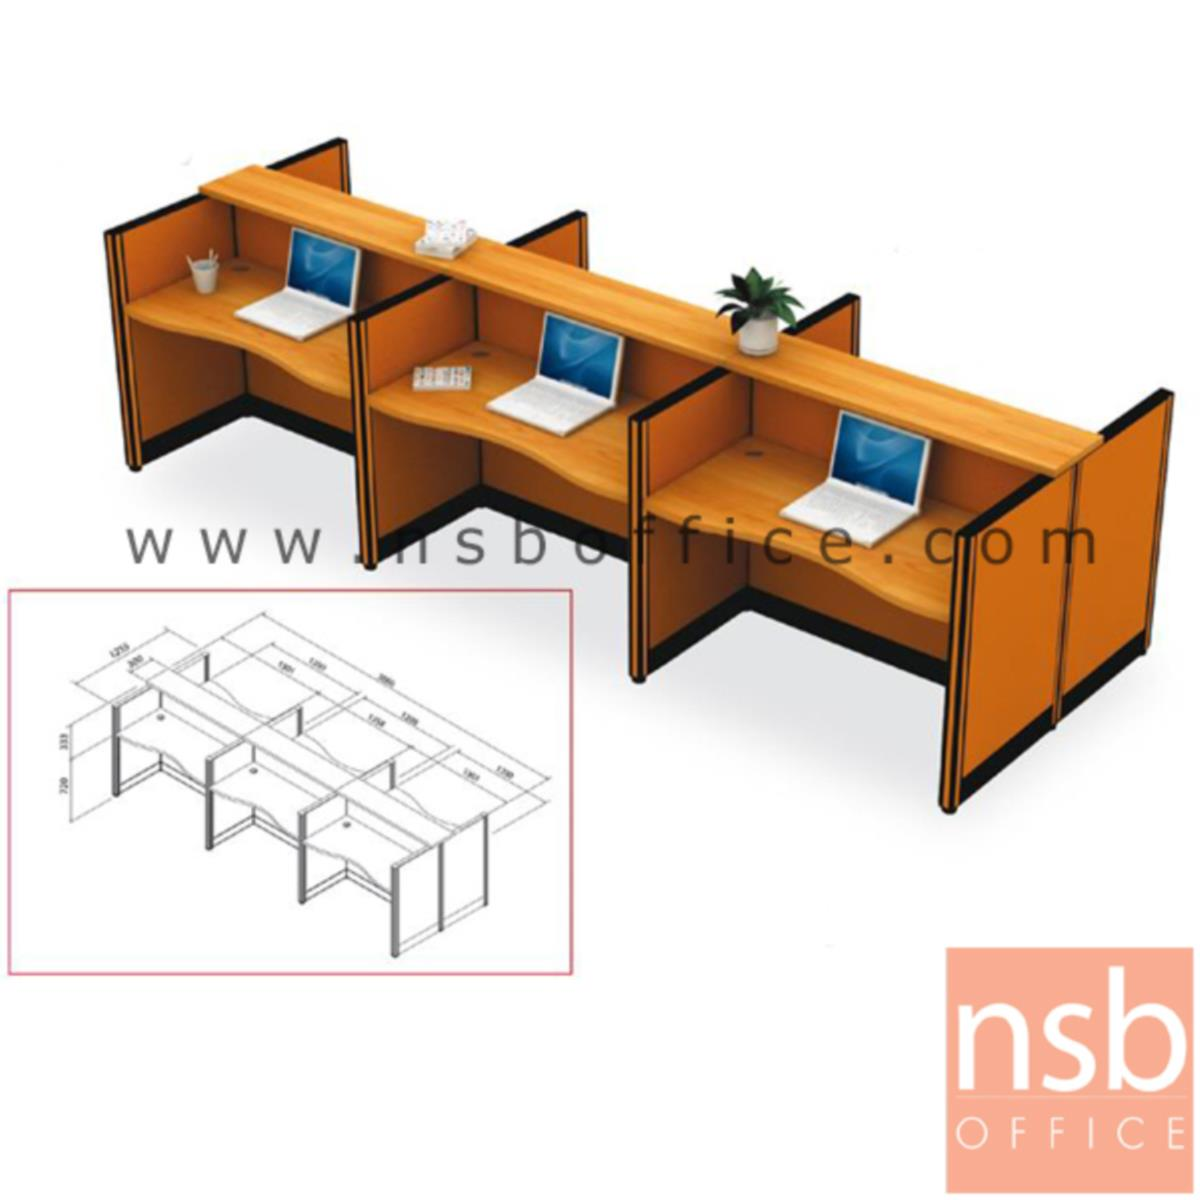 A04A052:ชุดโต๊ะทำงานกลุ่ม 6 ที่นั่ง   พร้อมที่วางของส่วนกลาง